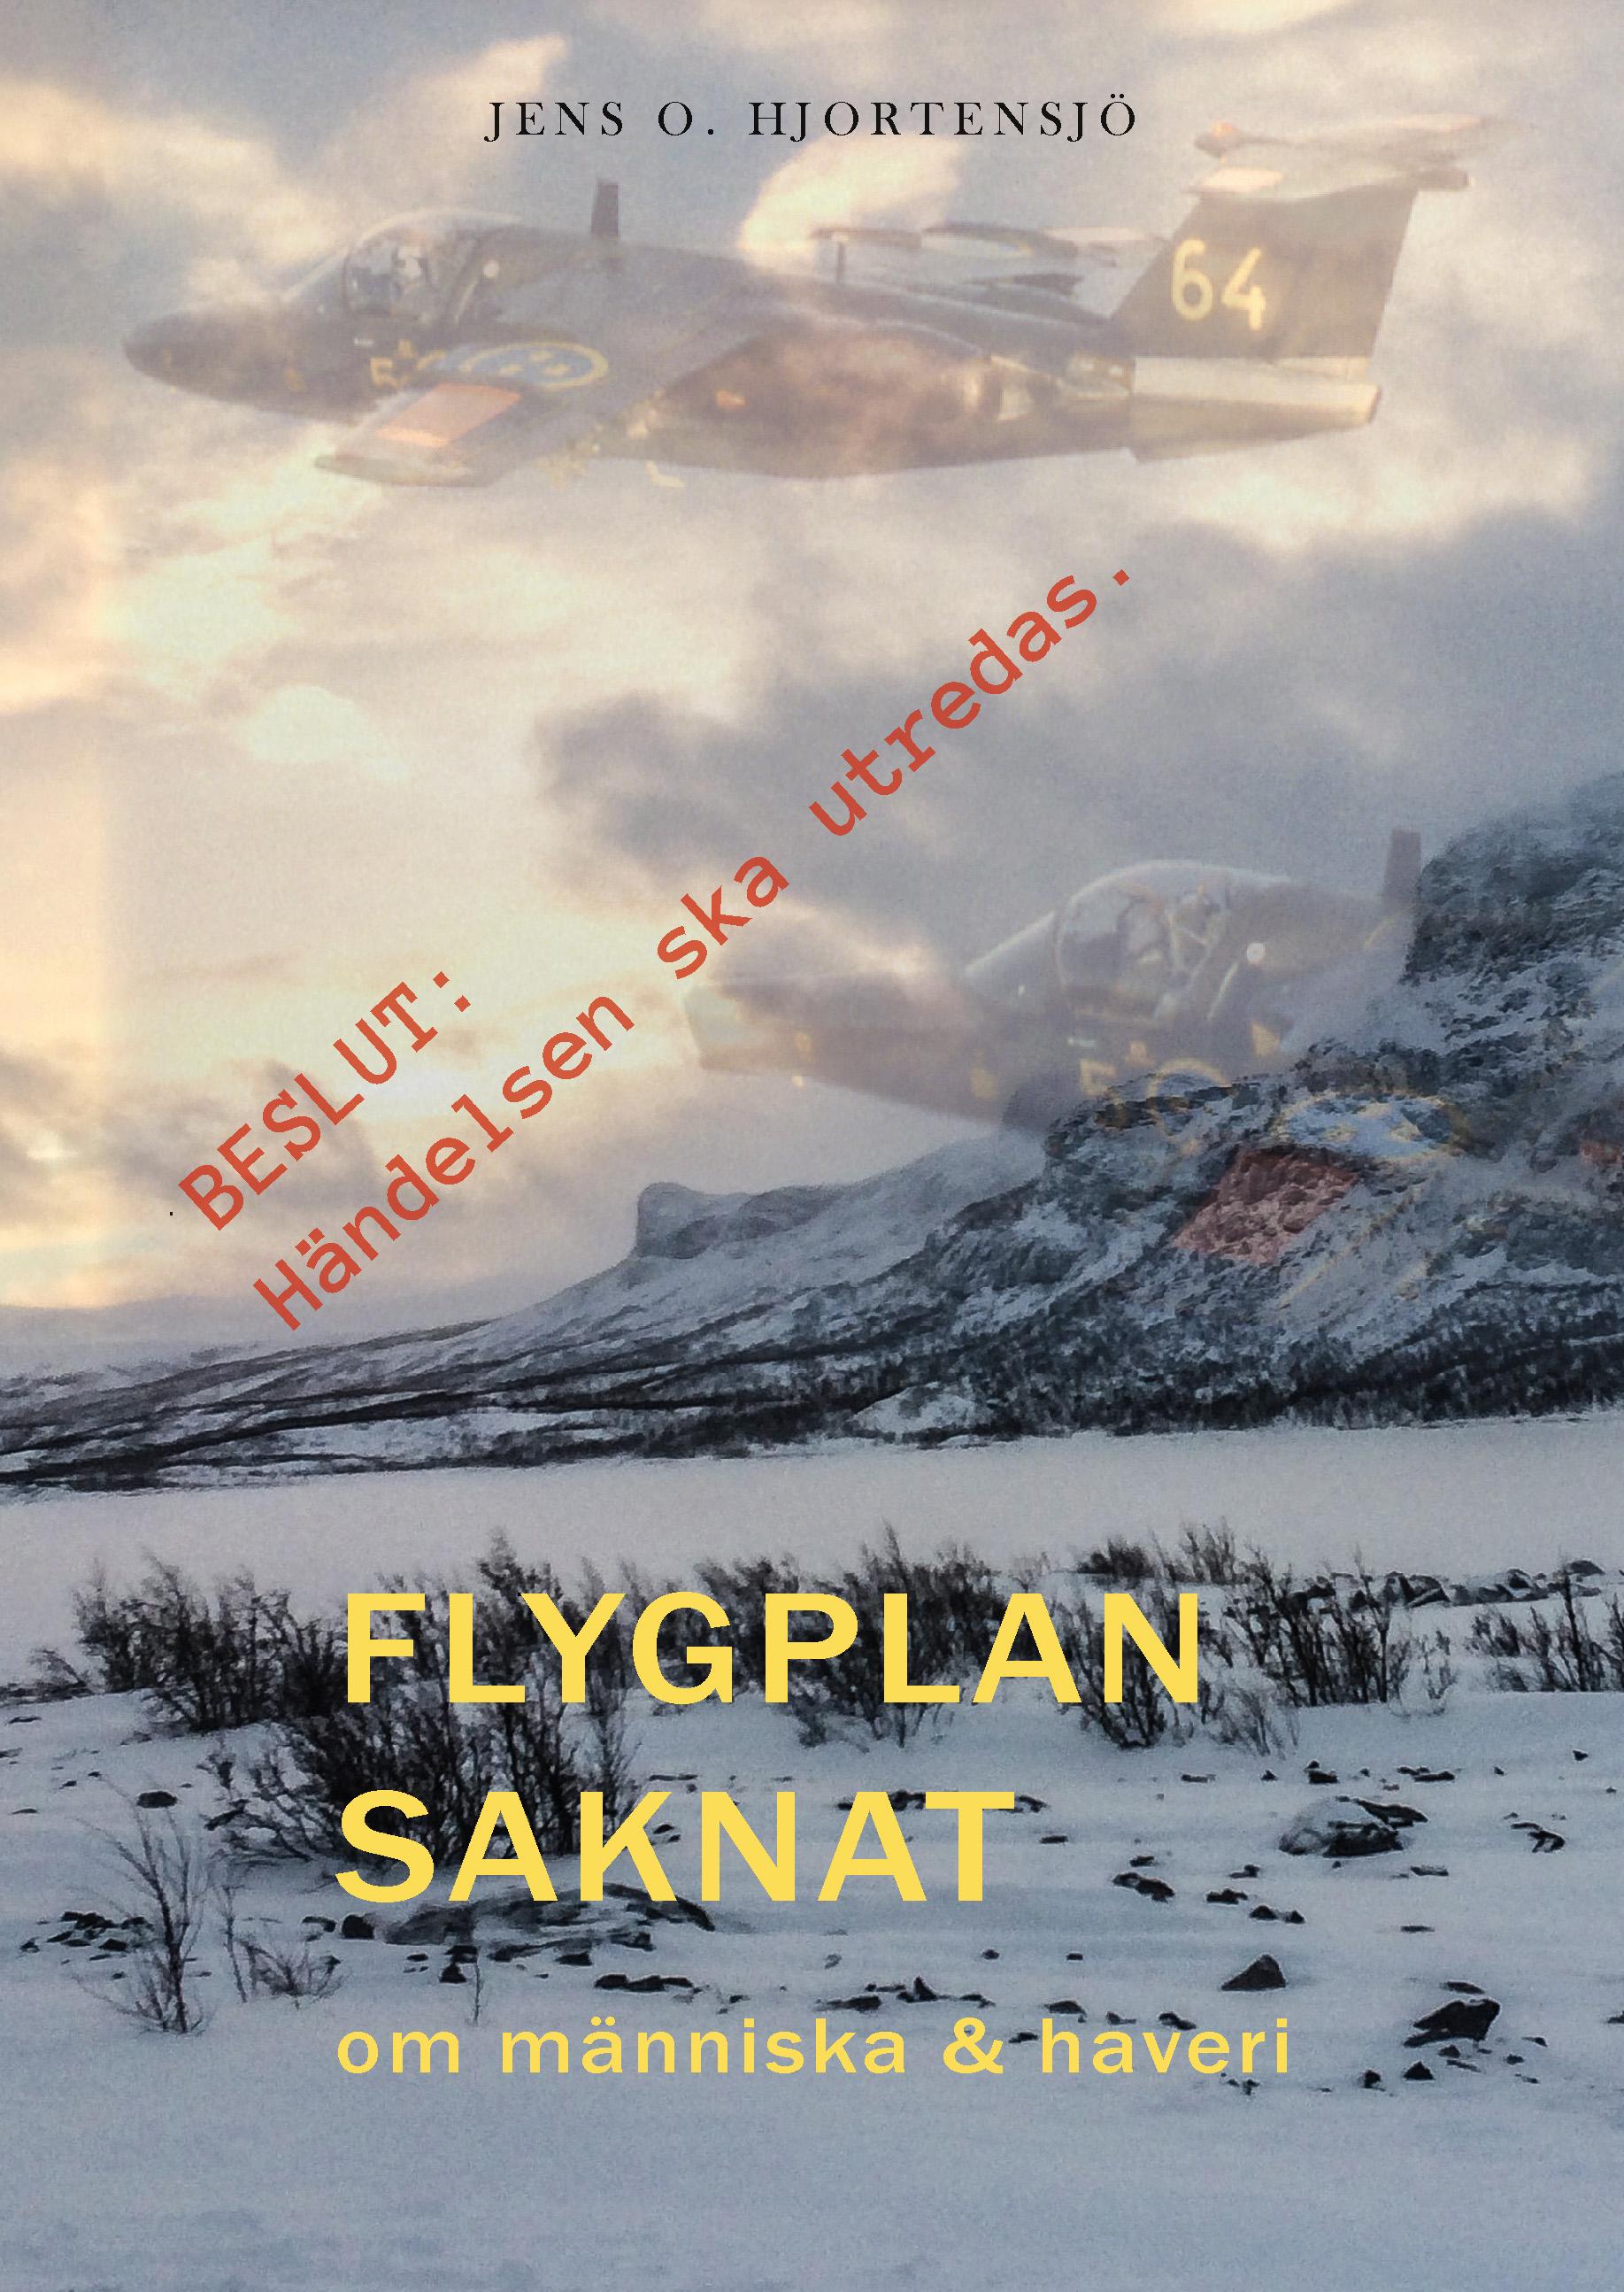 2044_Flygplan_saknat_jacket_p1